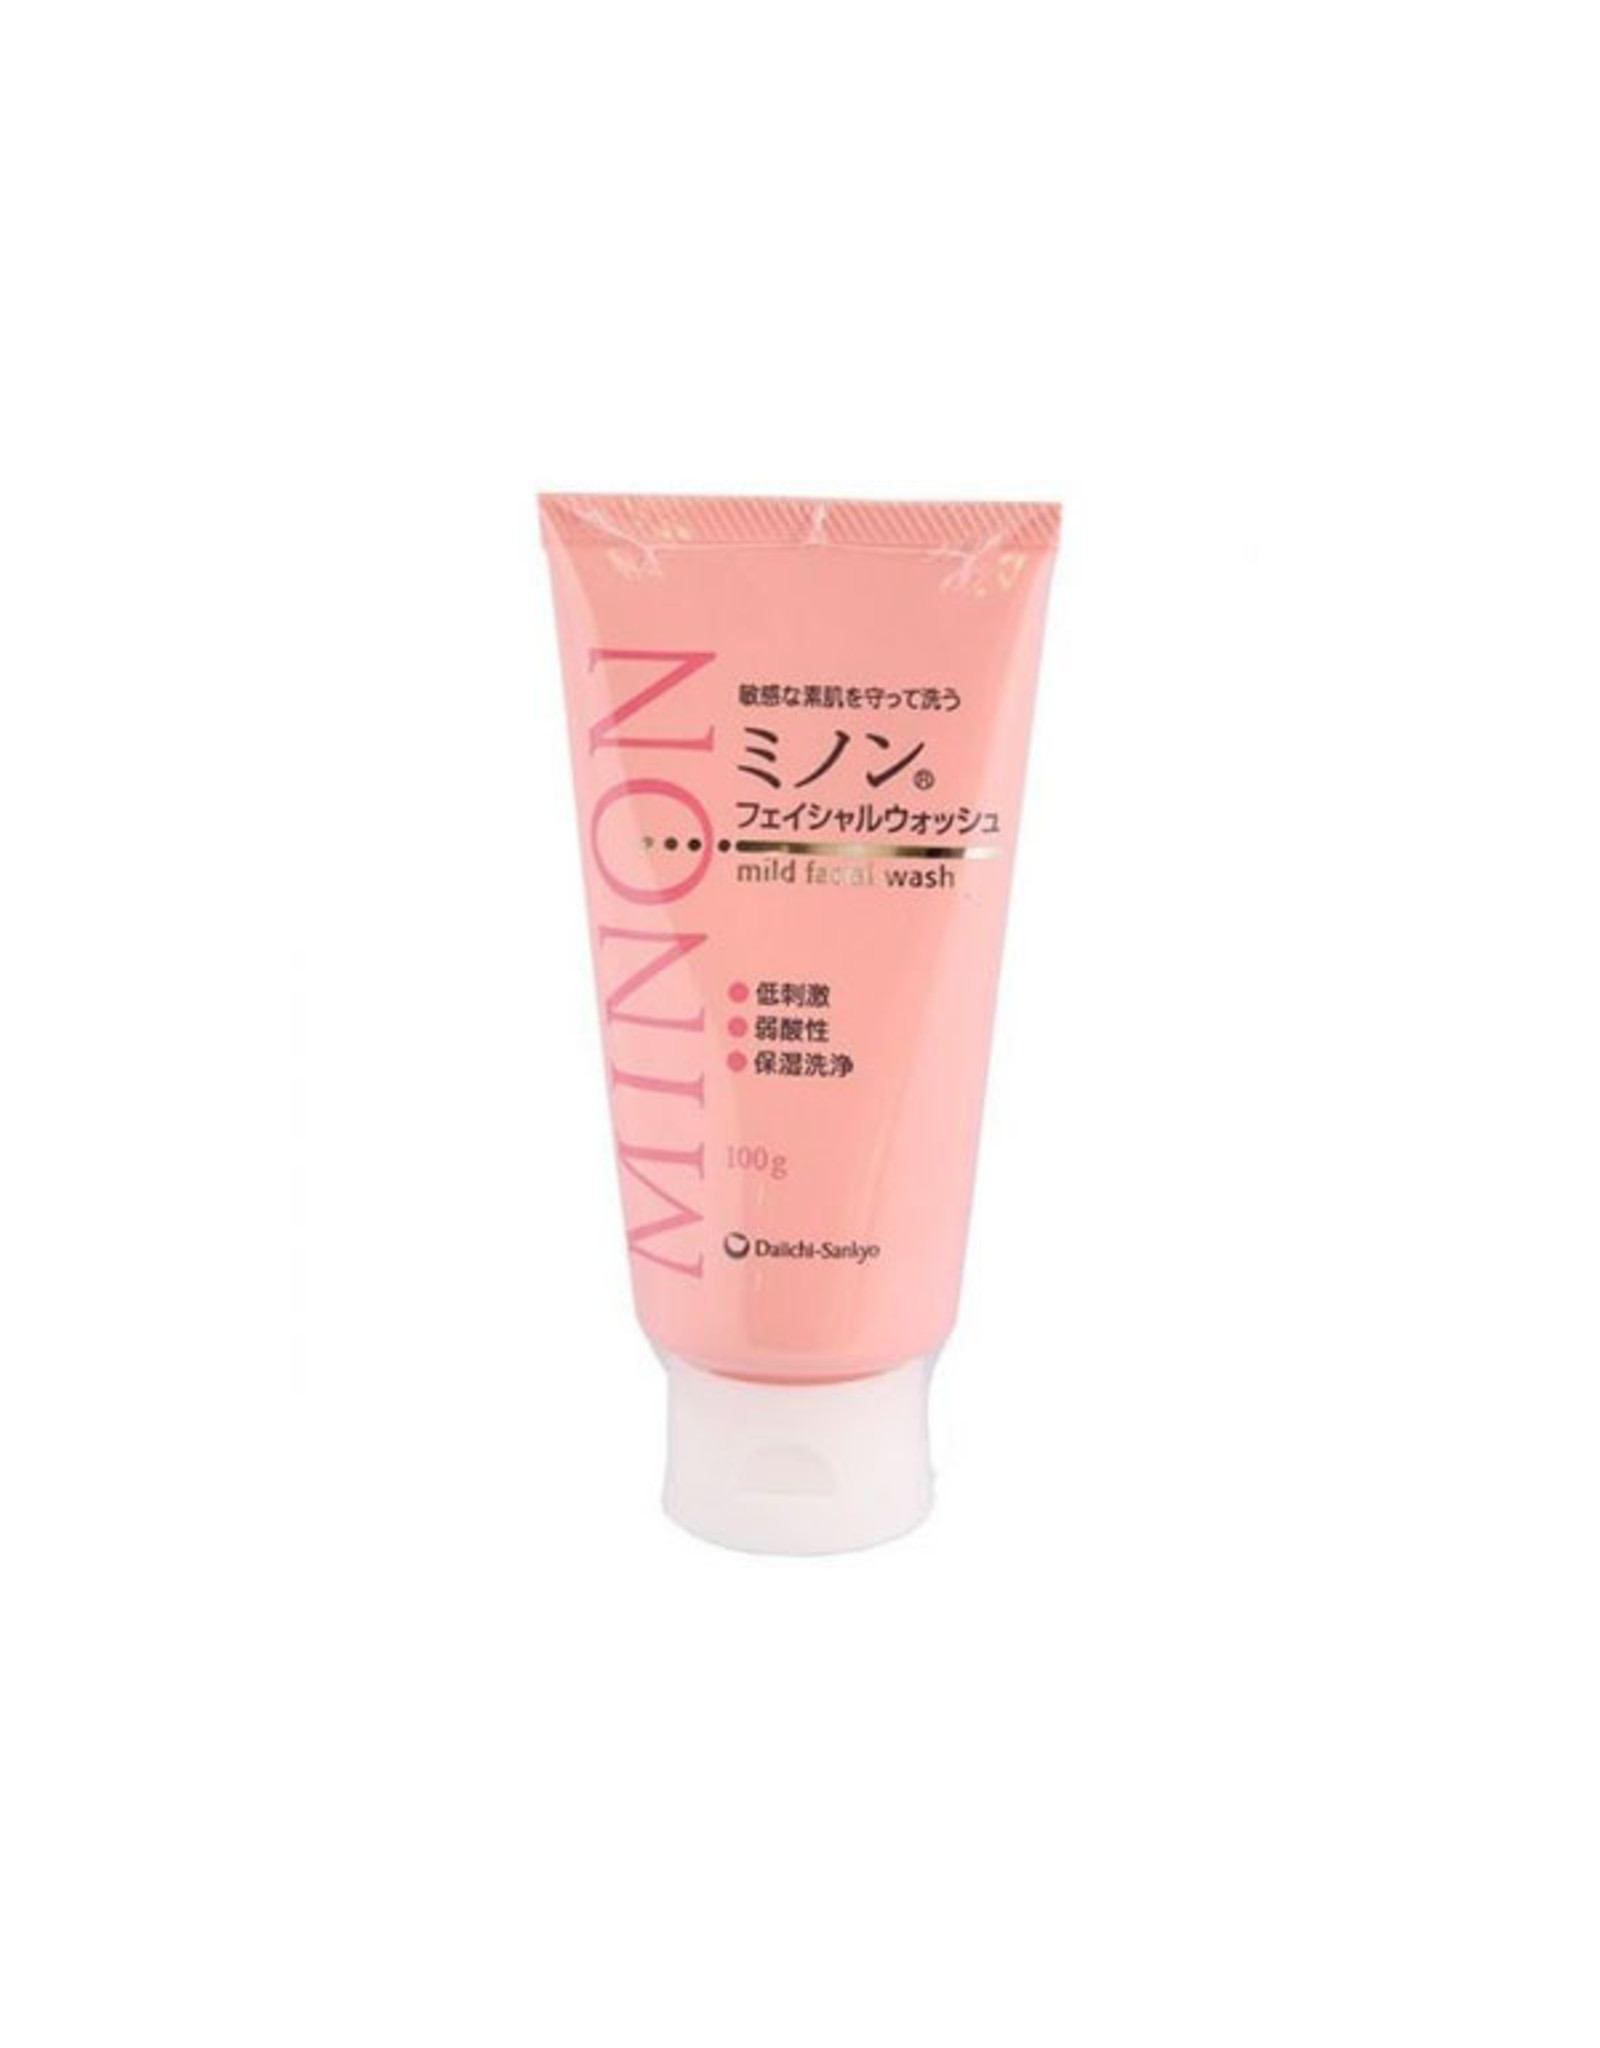 Minon Daiichi Sankyo Minon Mild Facial Wash 100g